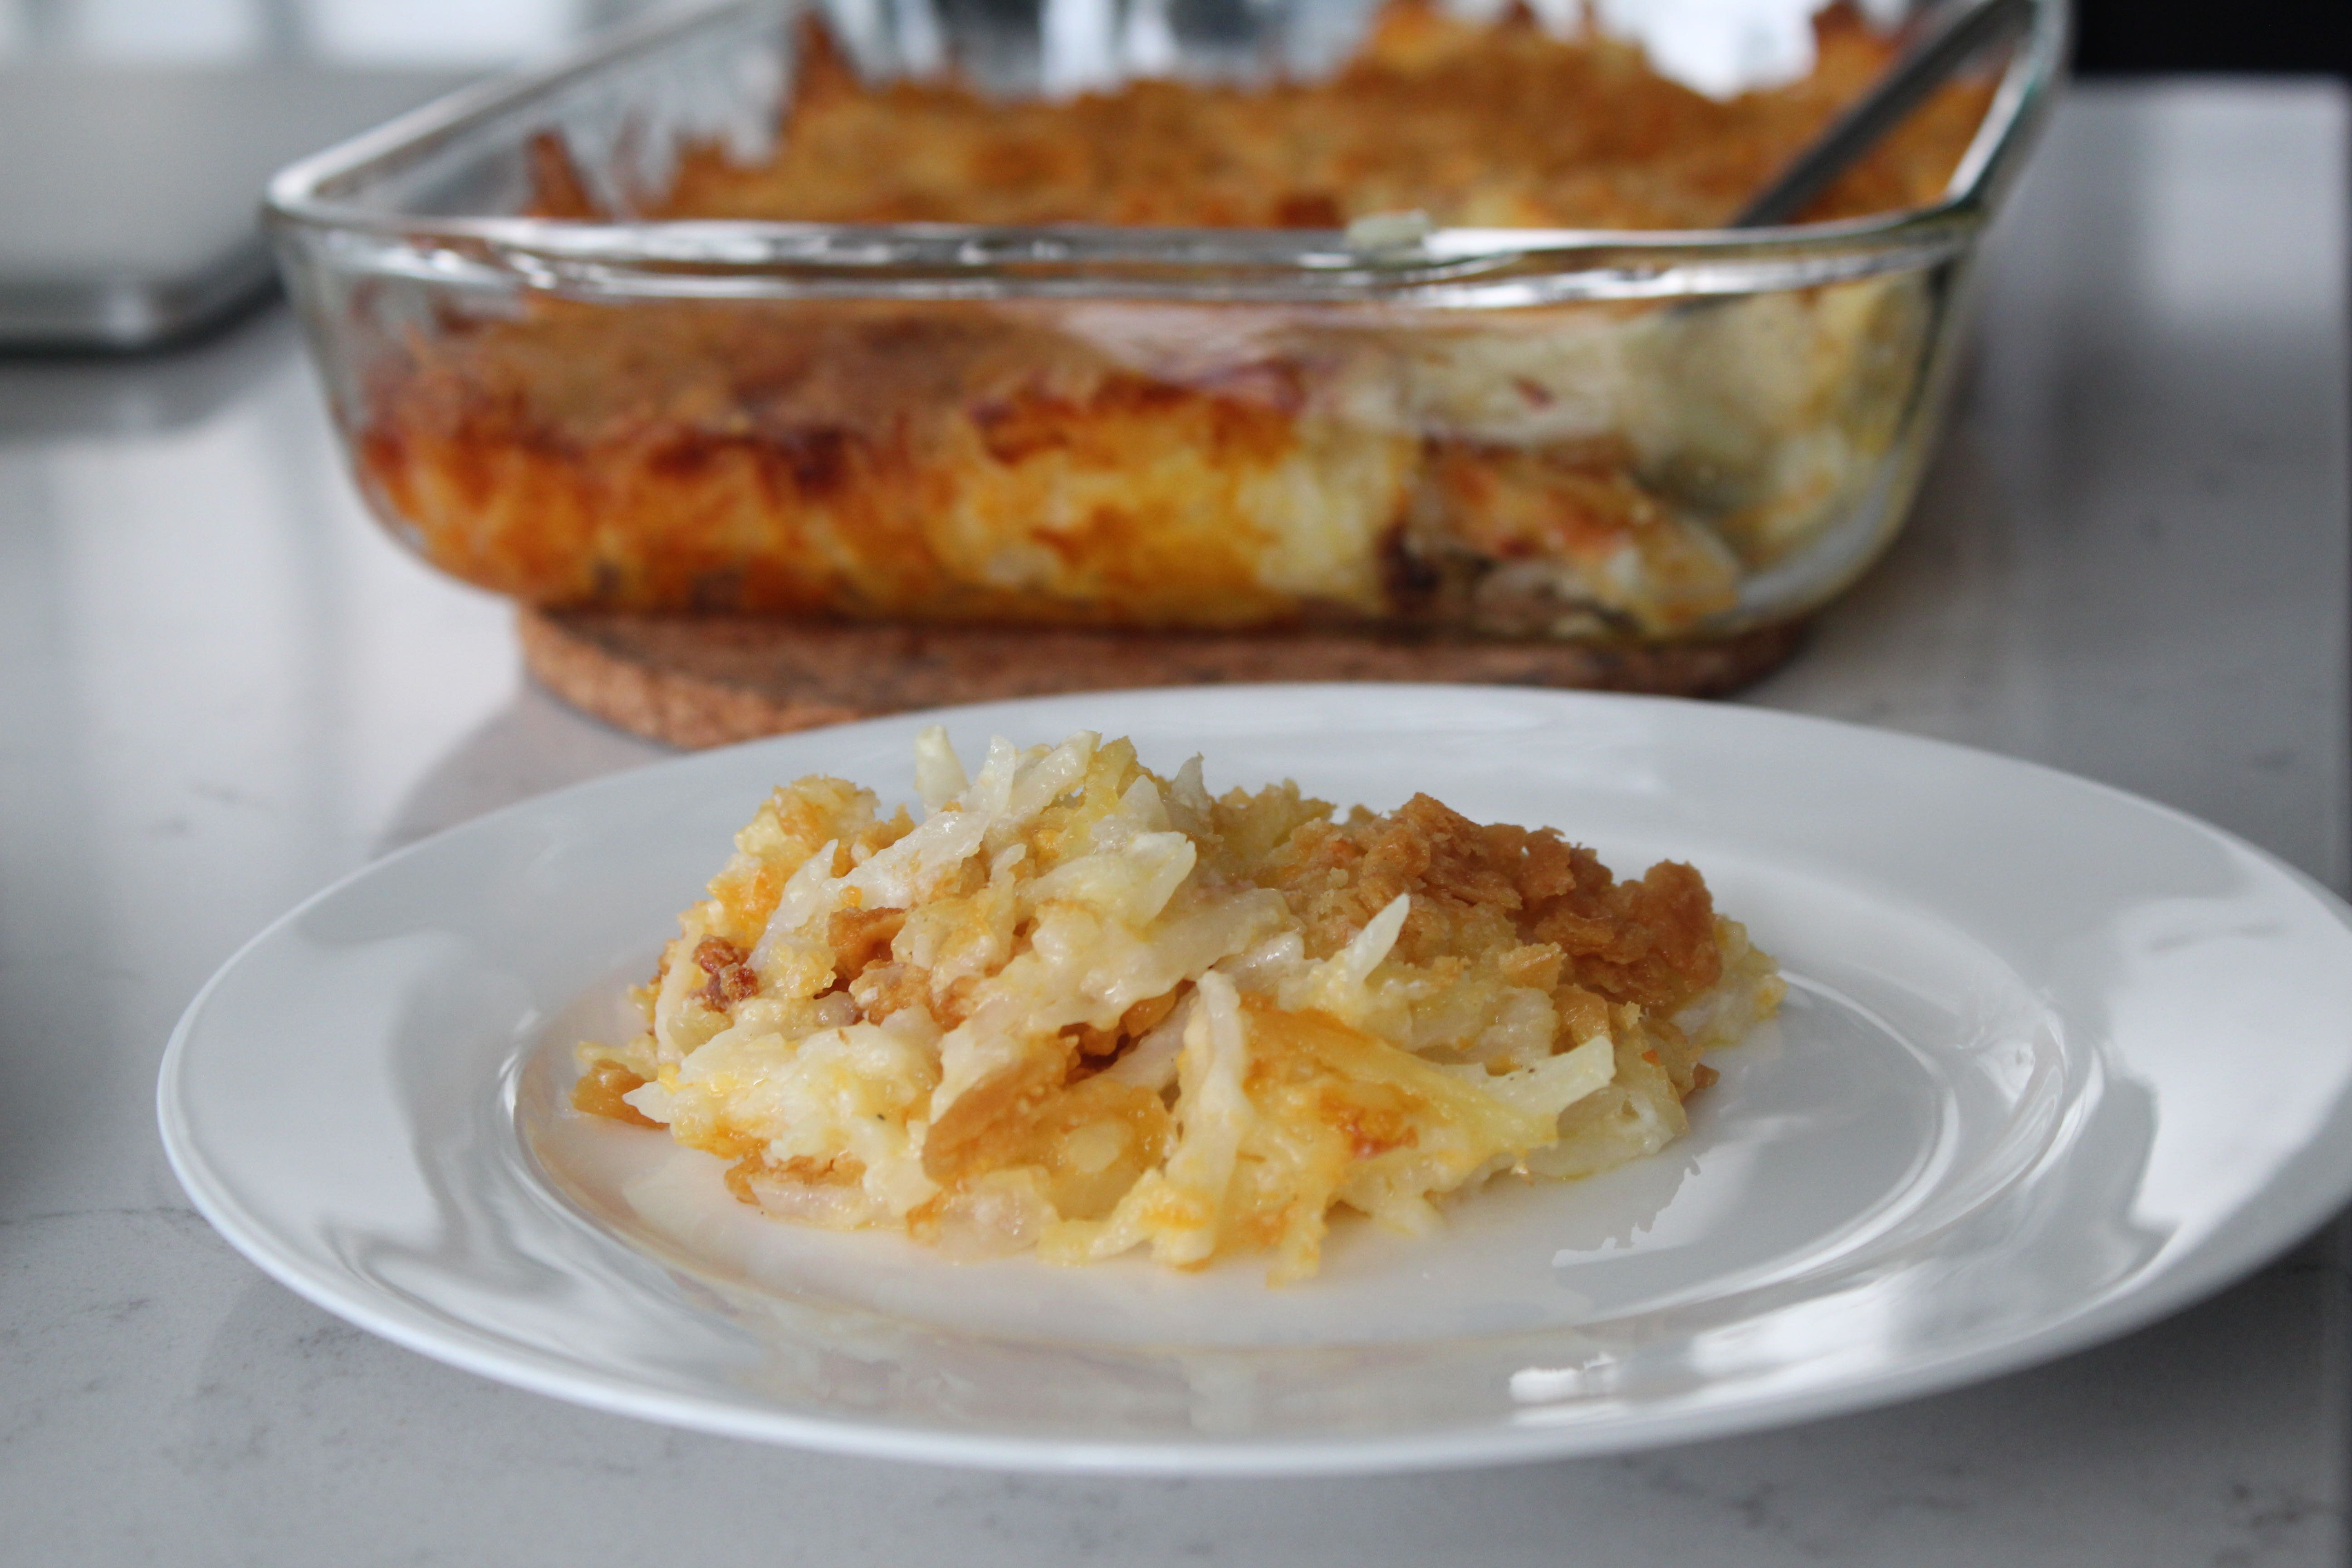 grandmas hash brown casserole recipe